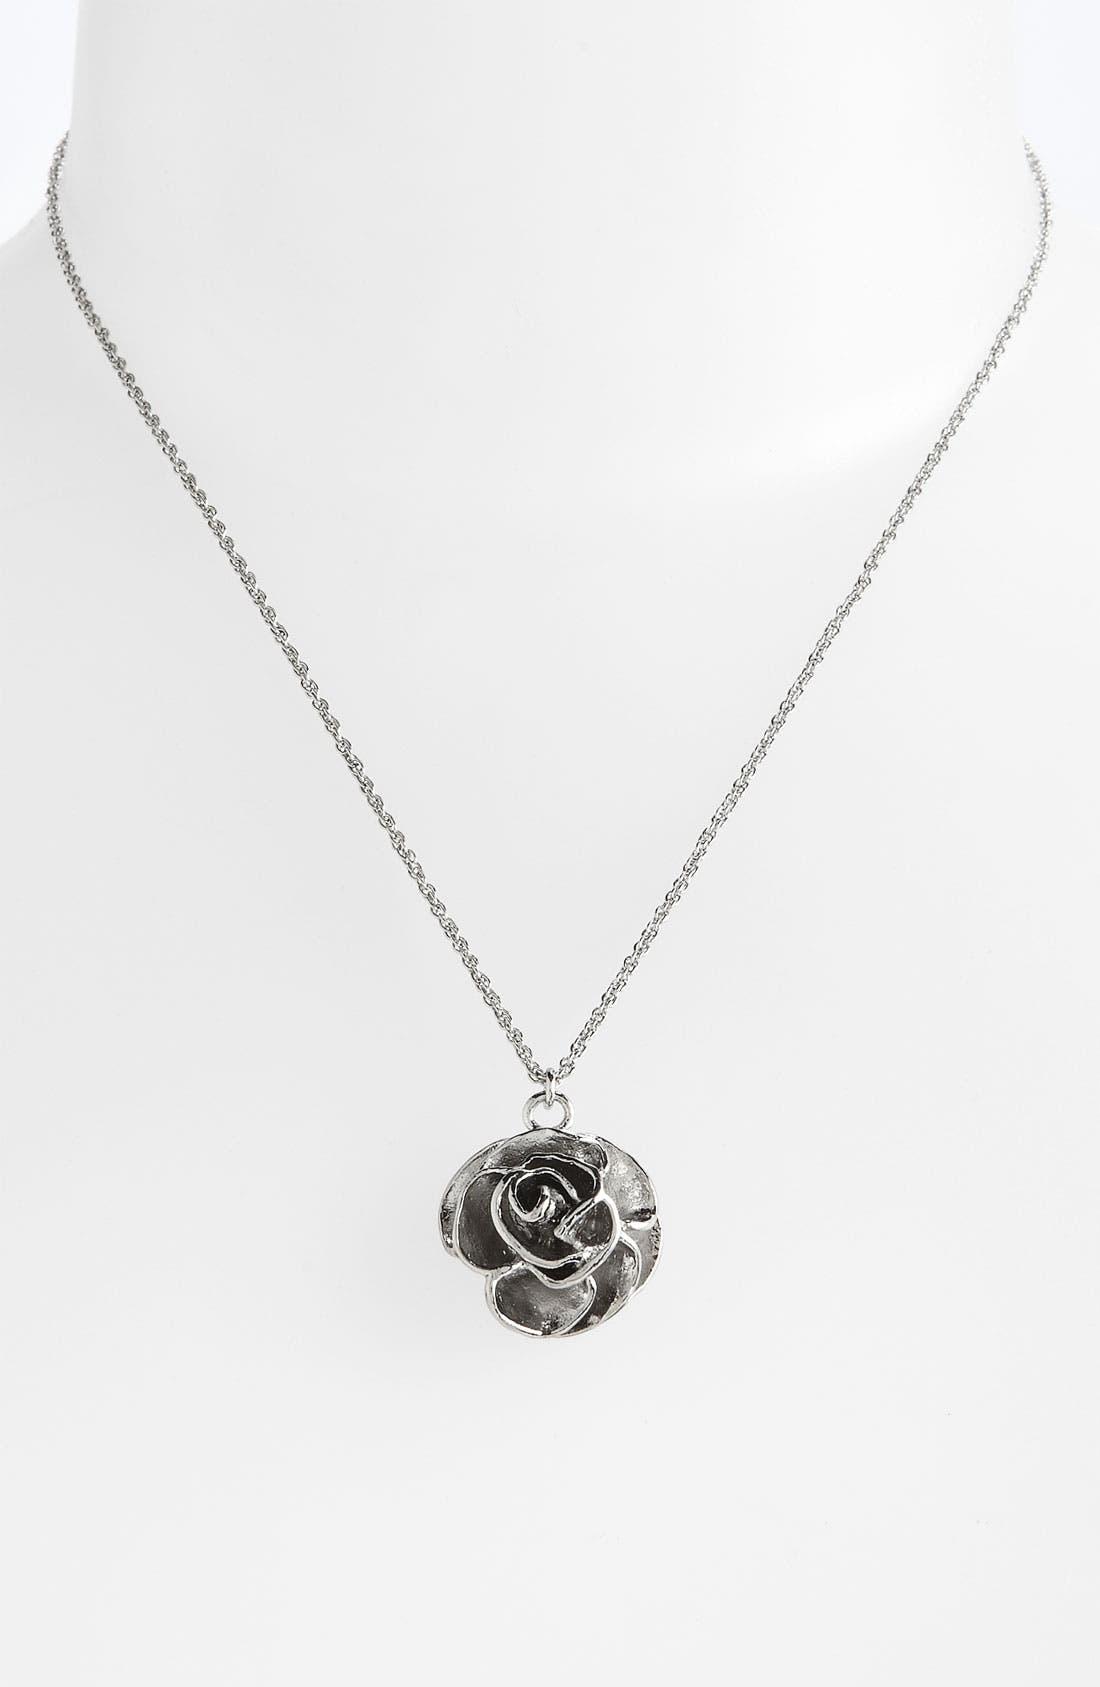 Main Image - Kendra Scott 'Michelle' Rose Pendant Necklace